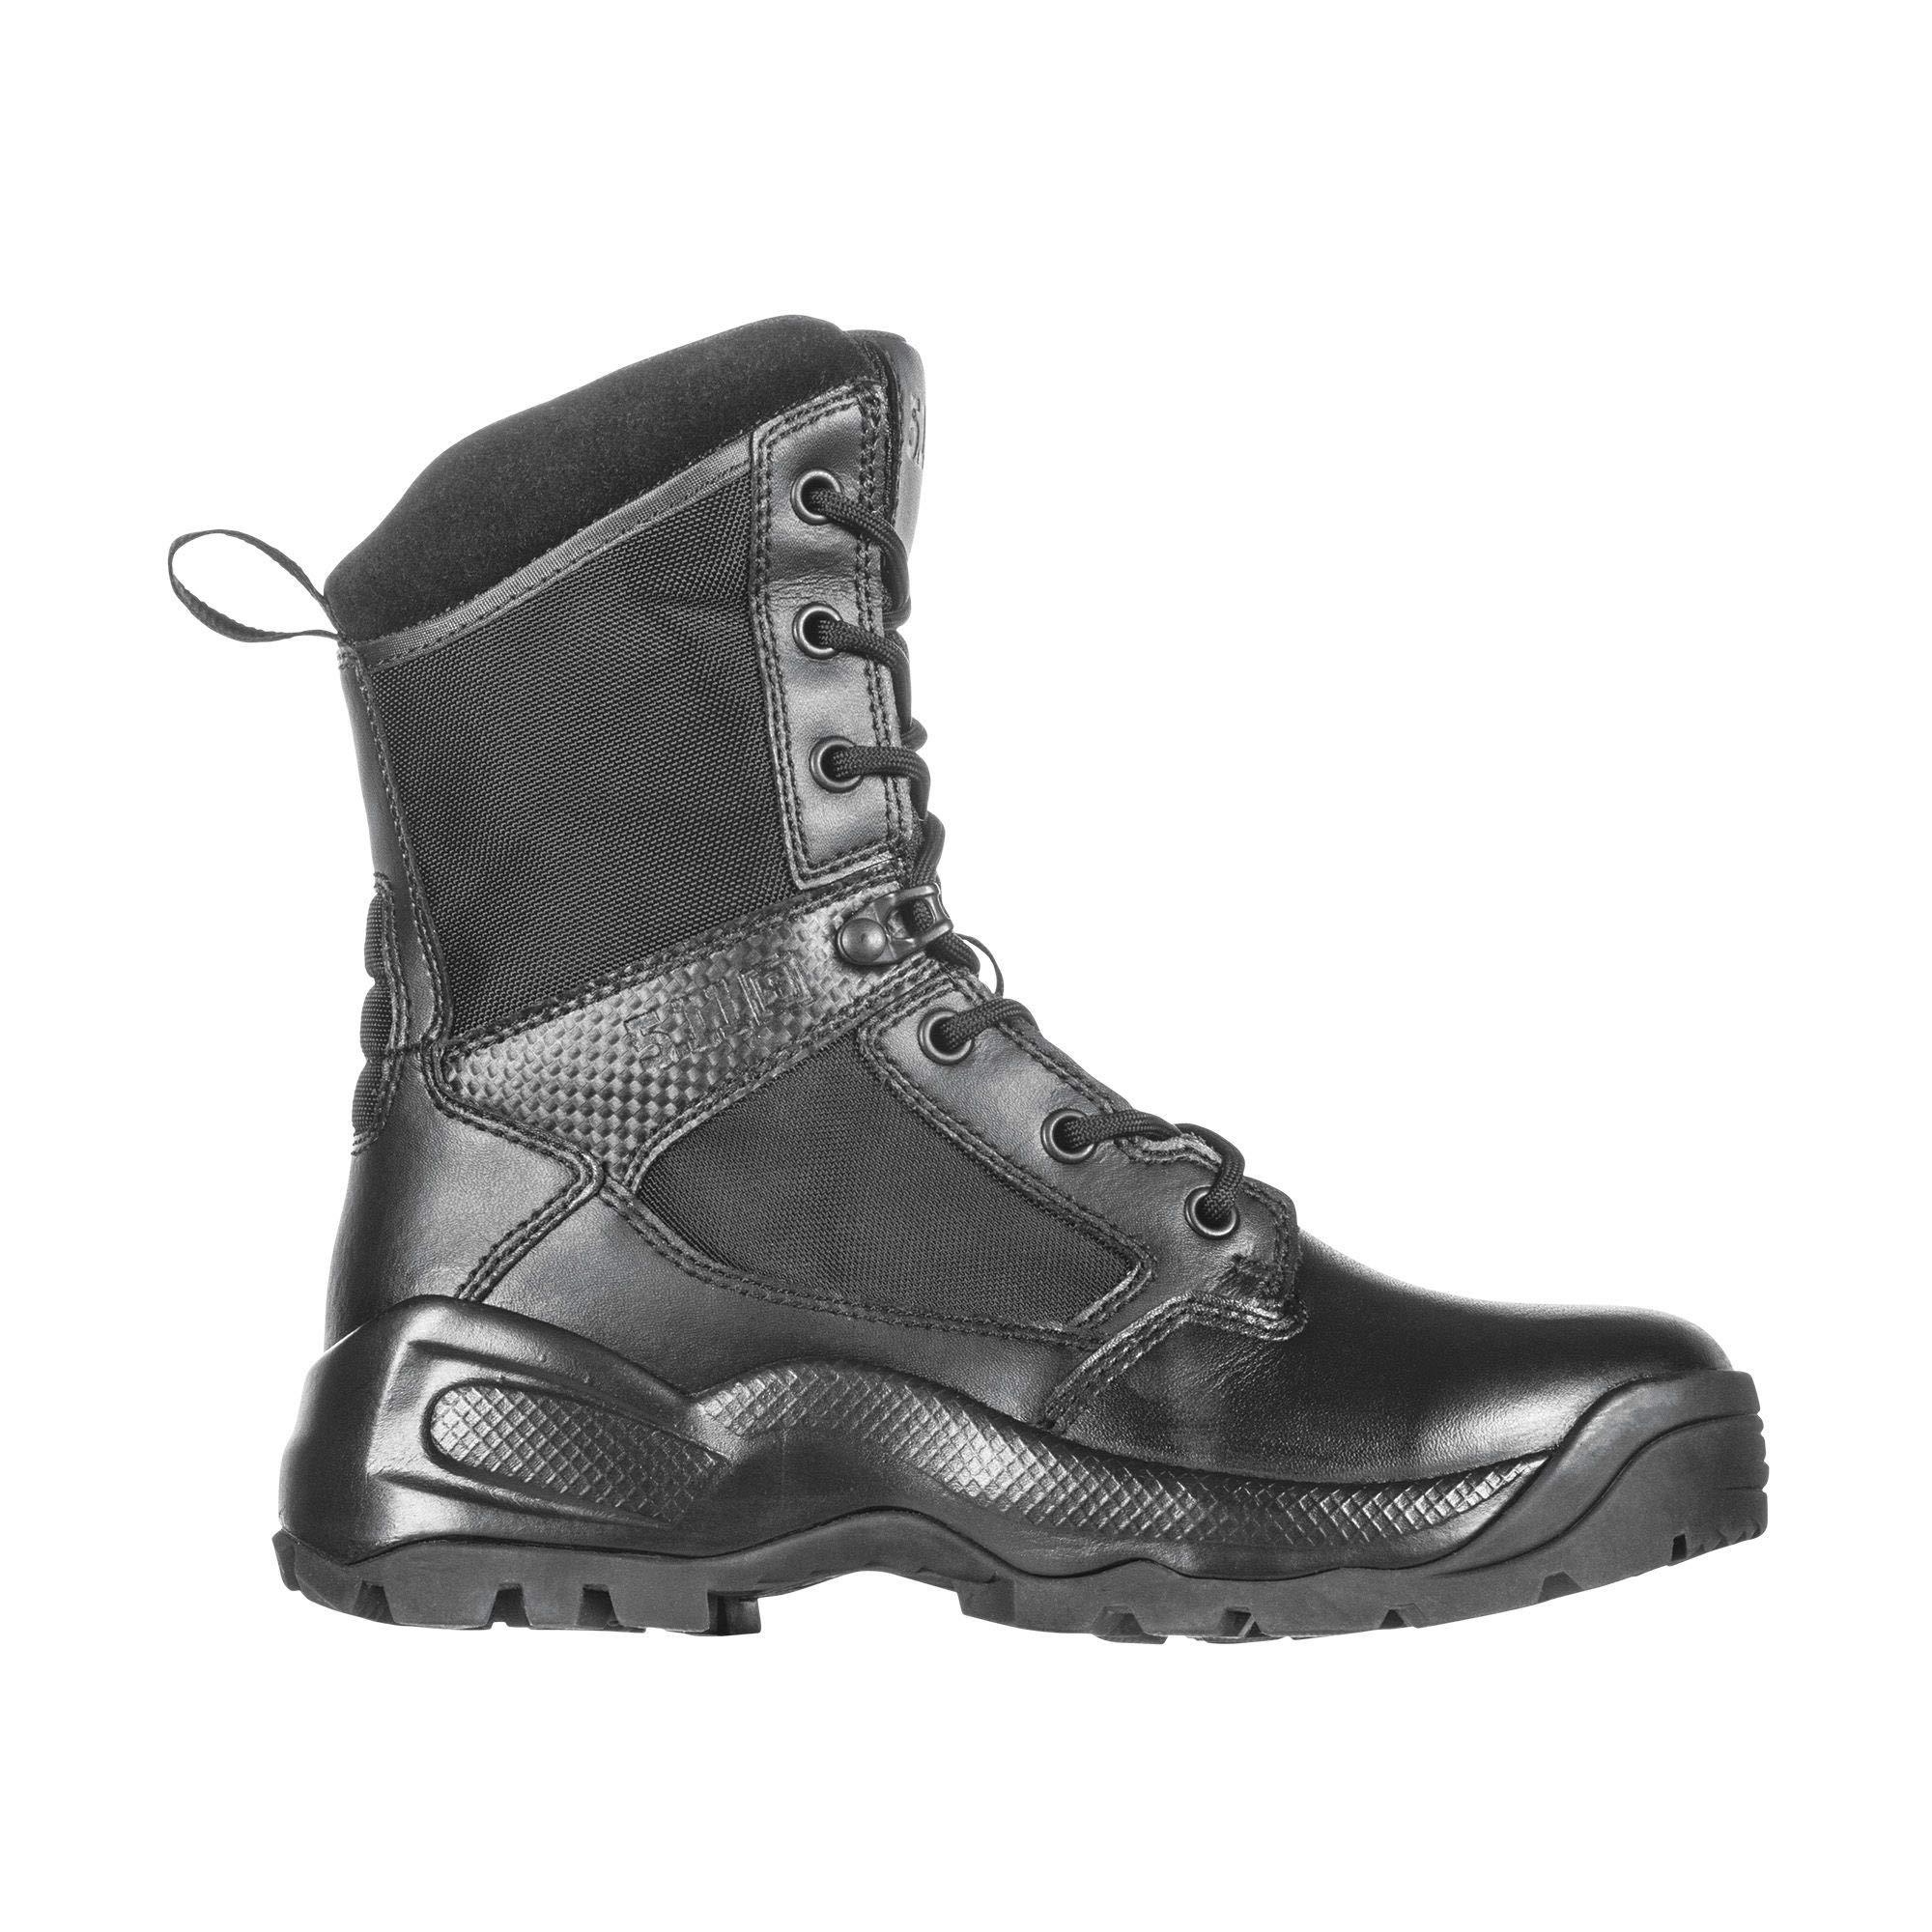 5.11 Women's ATAC 2.0 8'' Tactical Side Zip Military Combat Boot, Style 12403, Black, 6 D(M) US